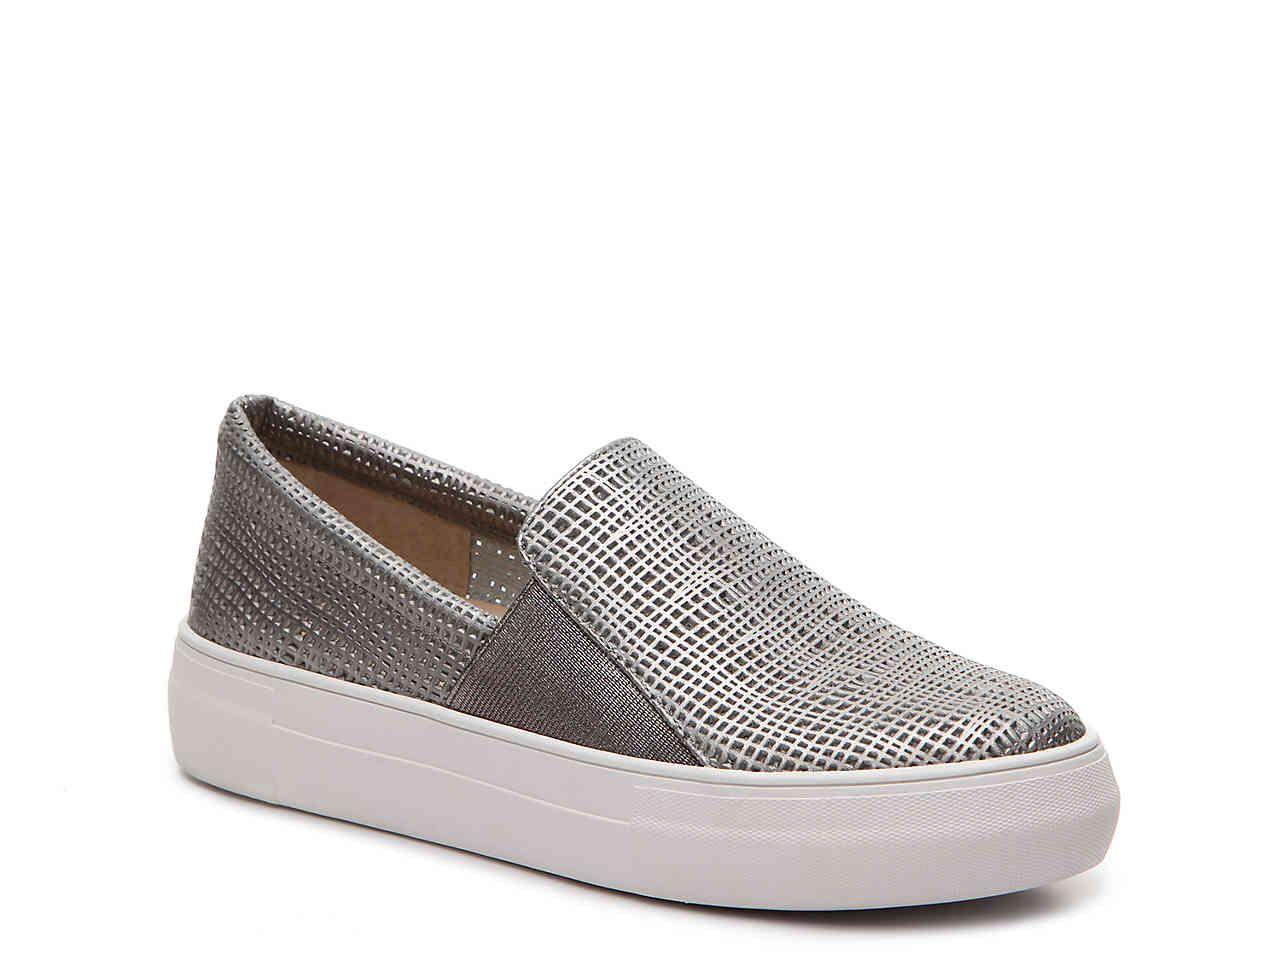 Vince Camuto Kanesya Platform Sneaker